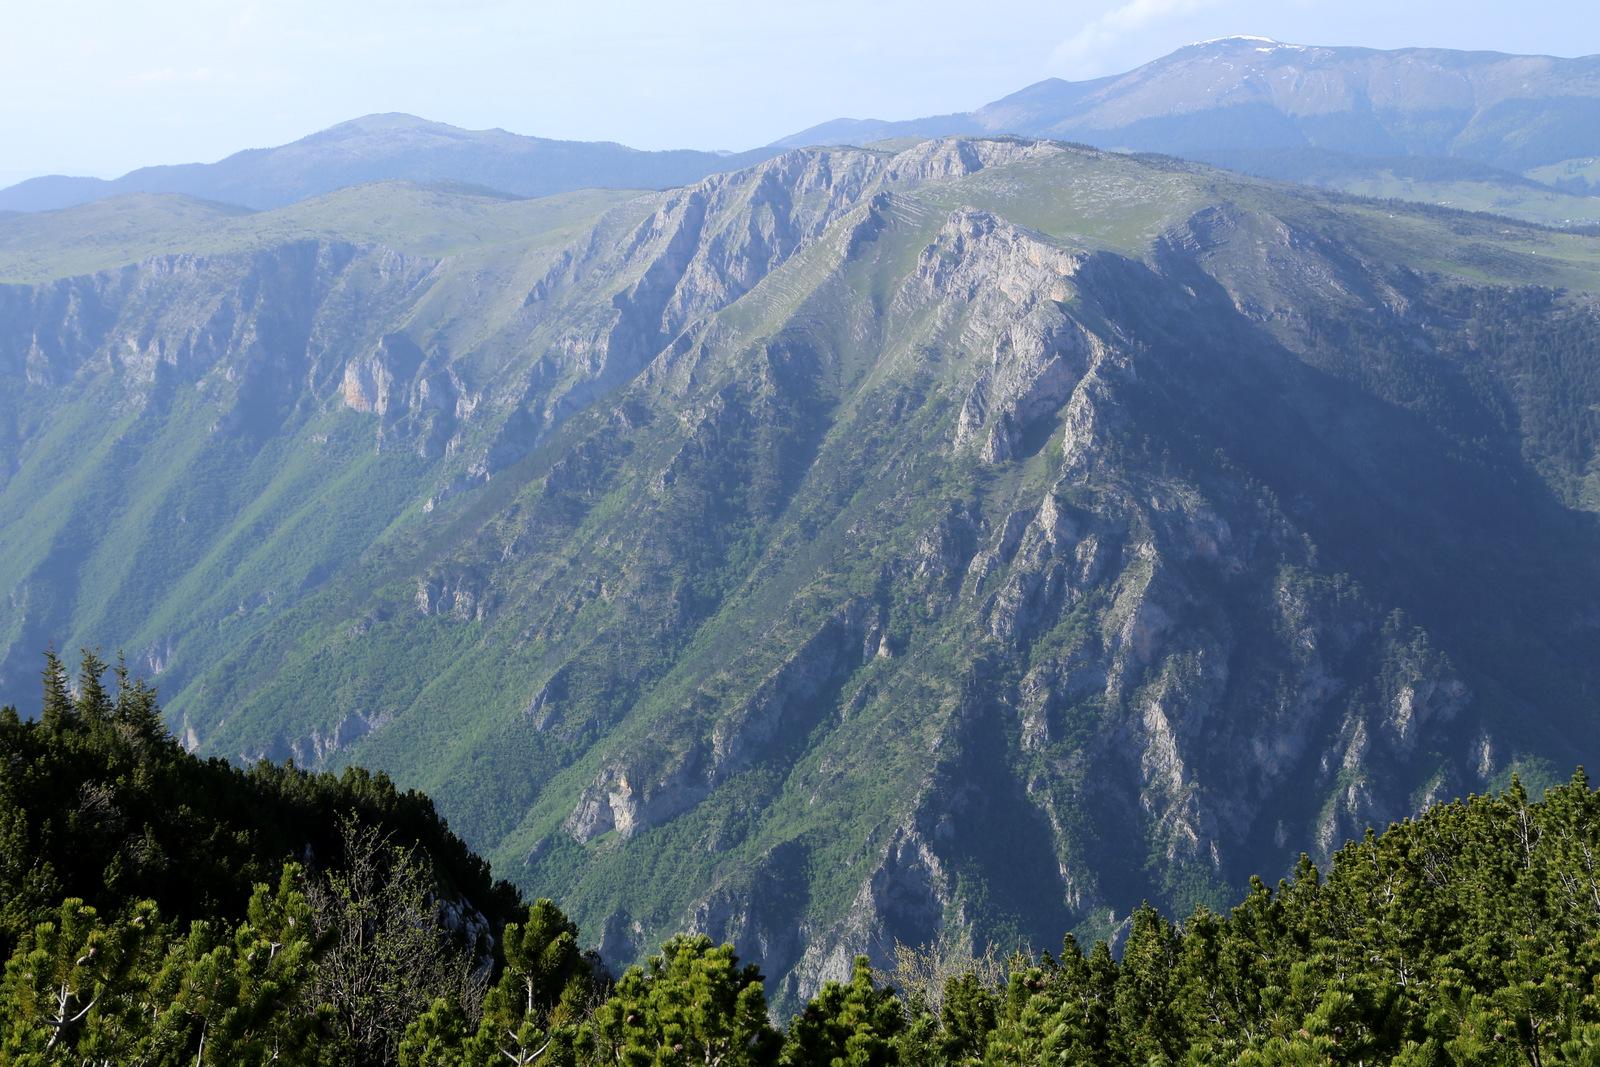 Views of Tara canyon from the narrow twisty road to Crna Gora village